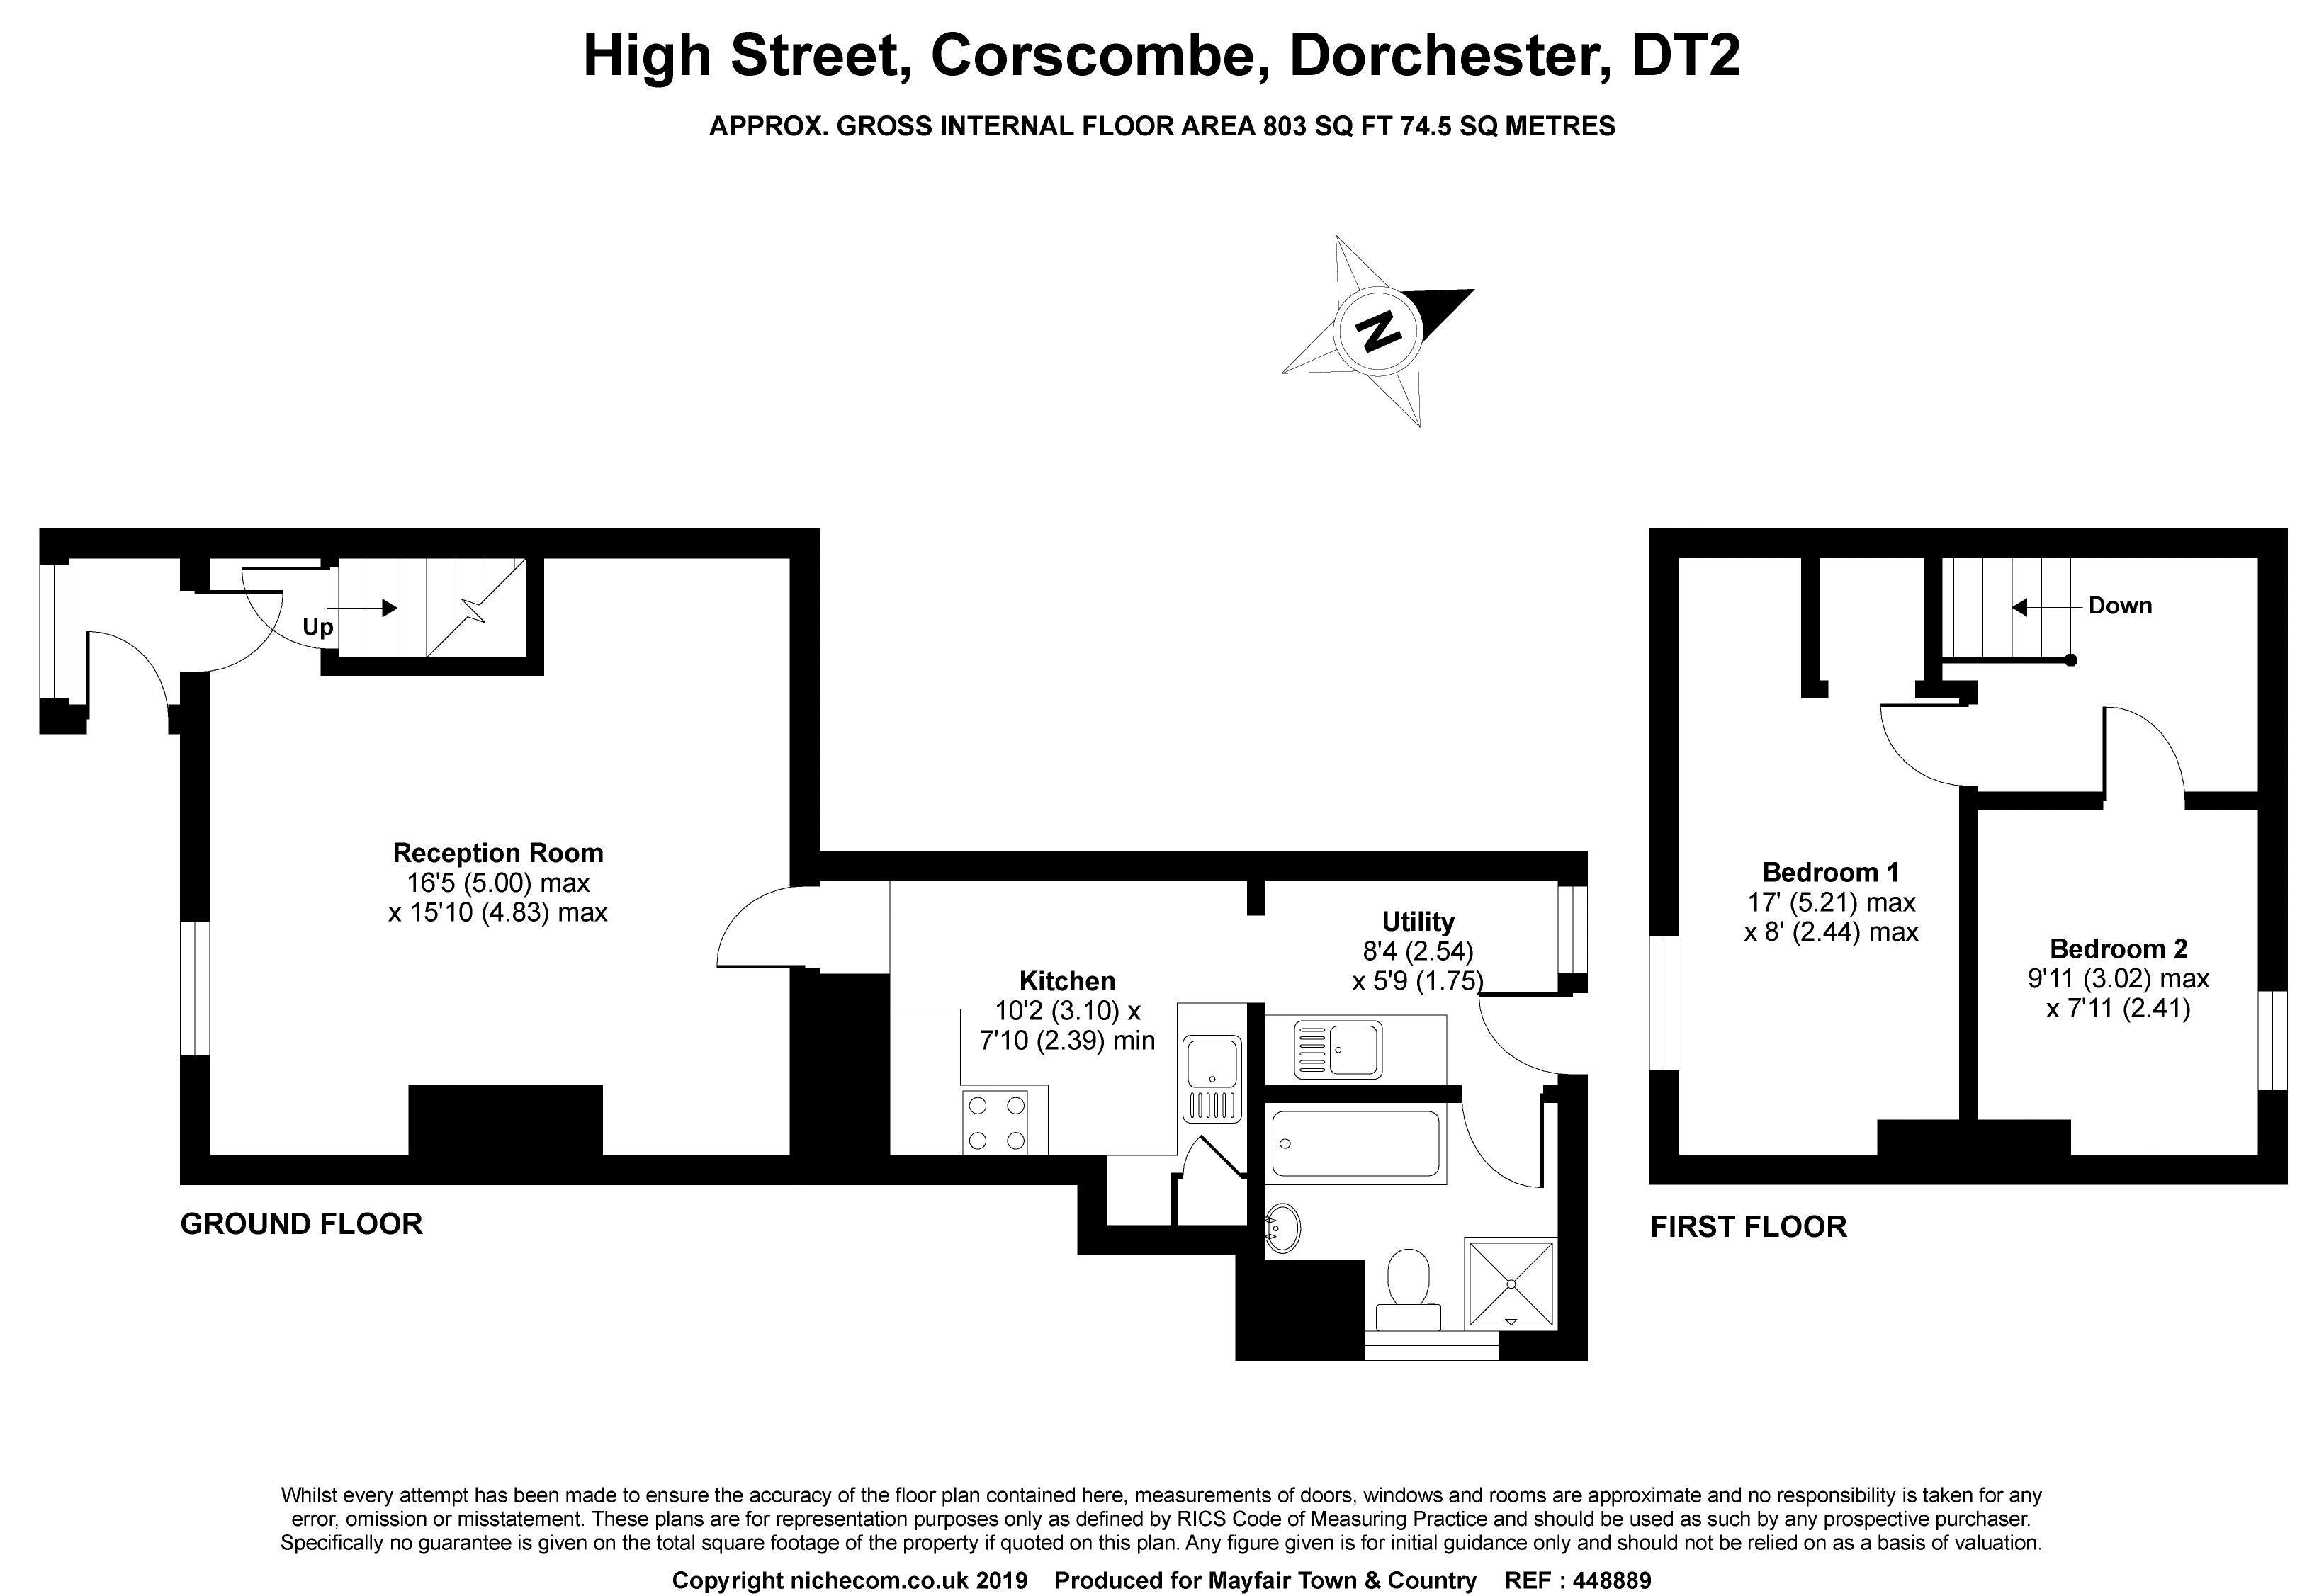 High Street Corscombe